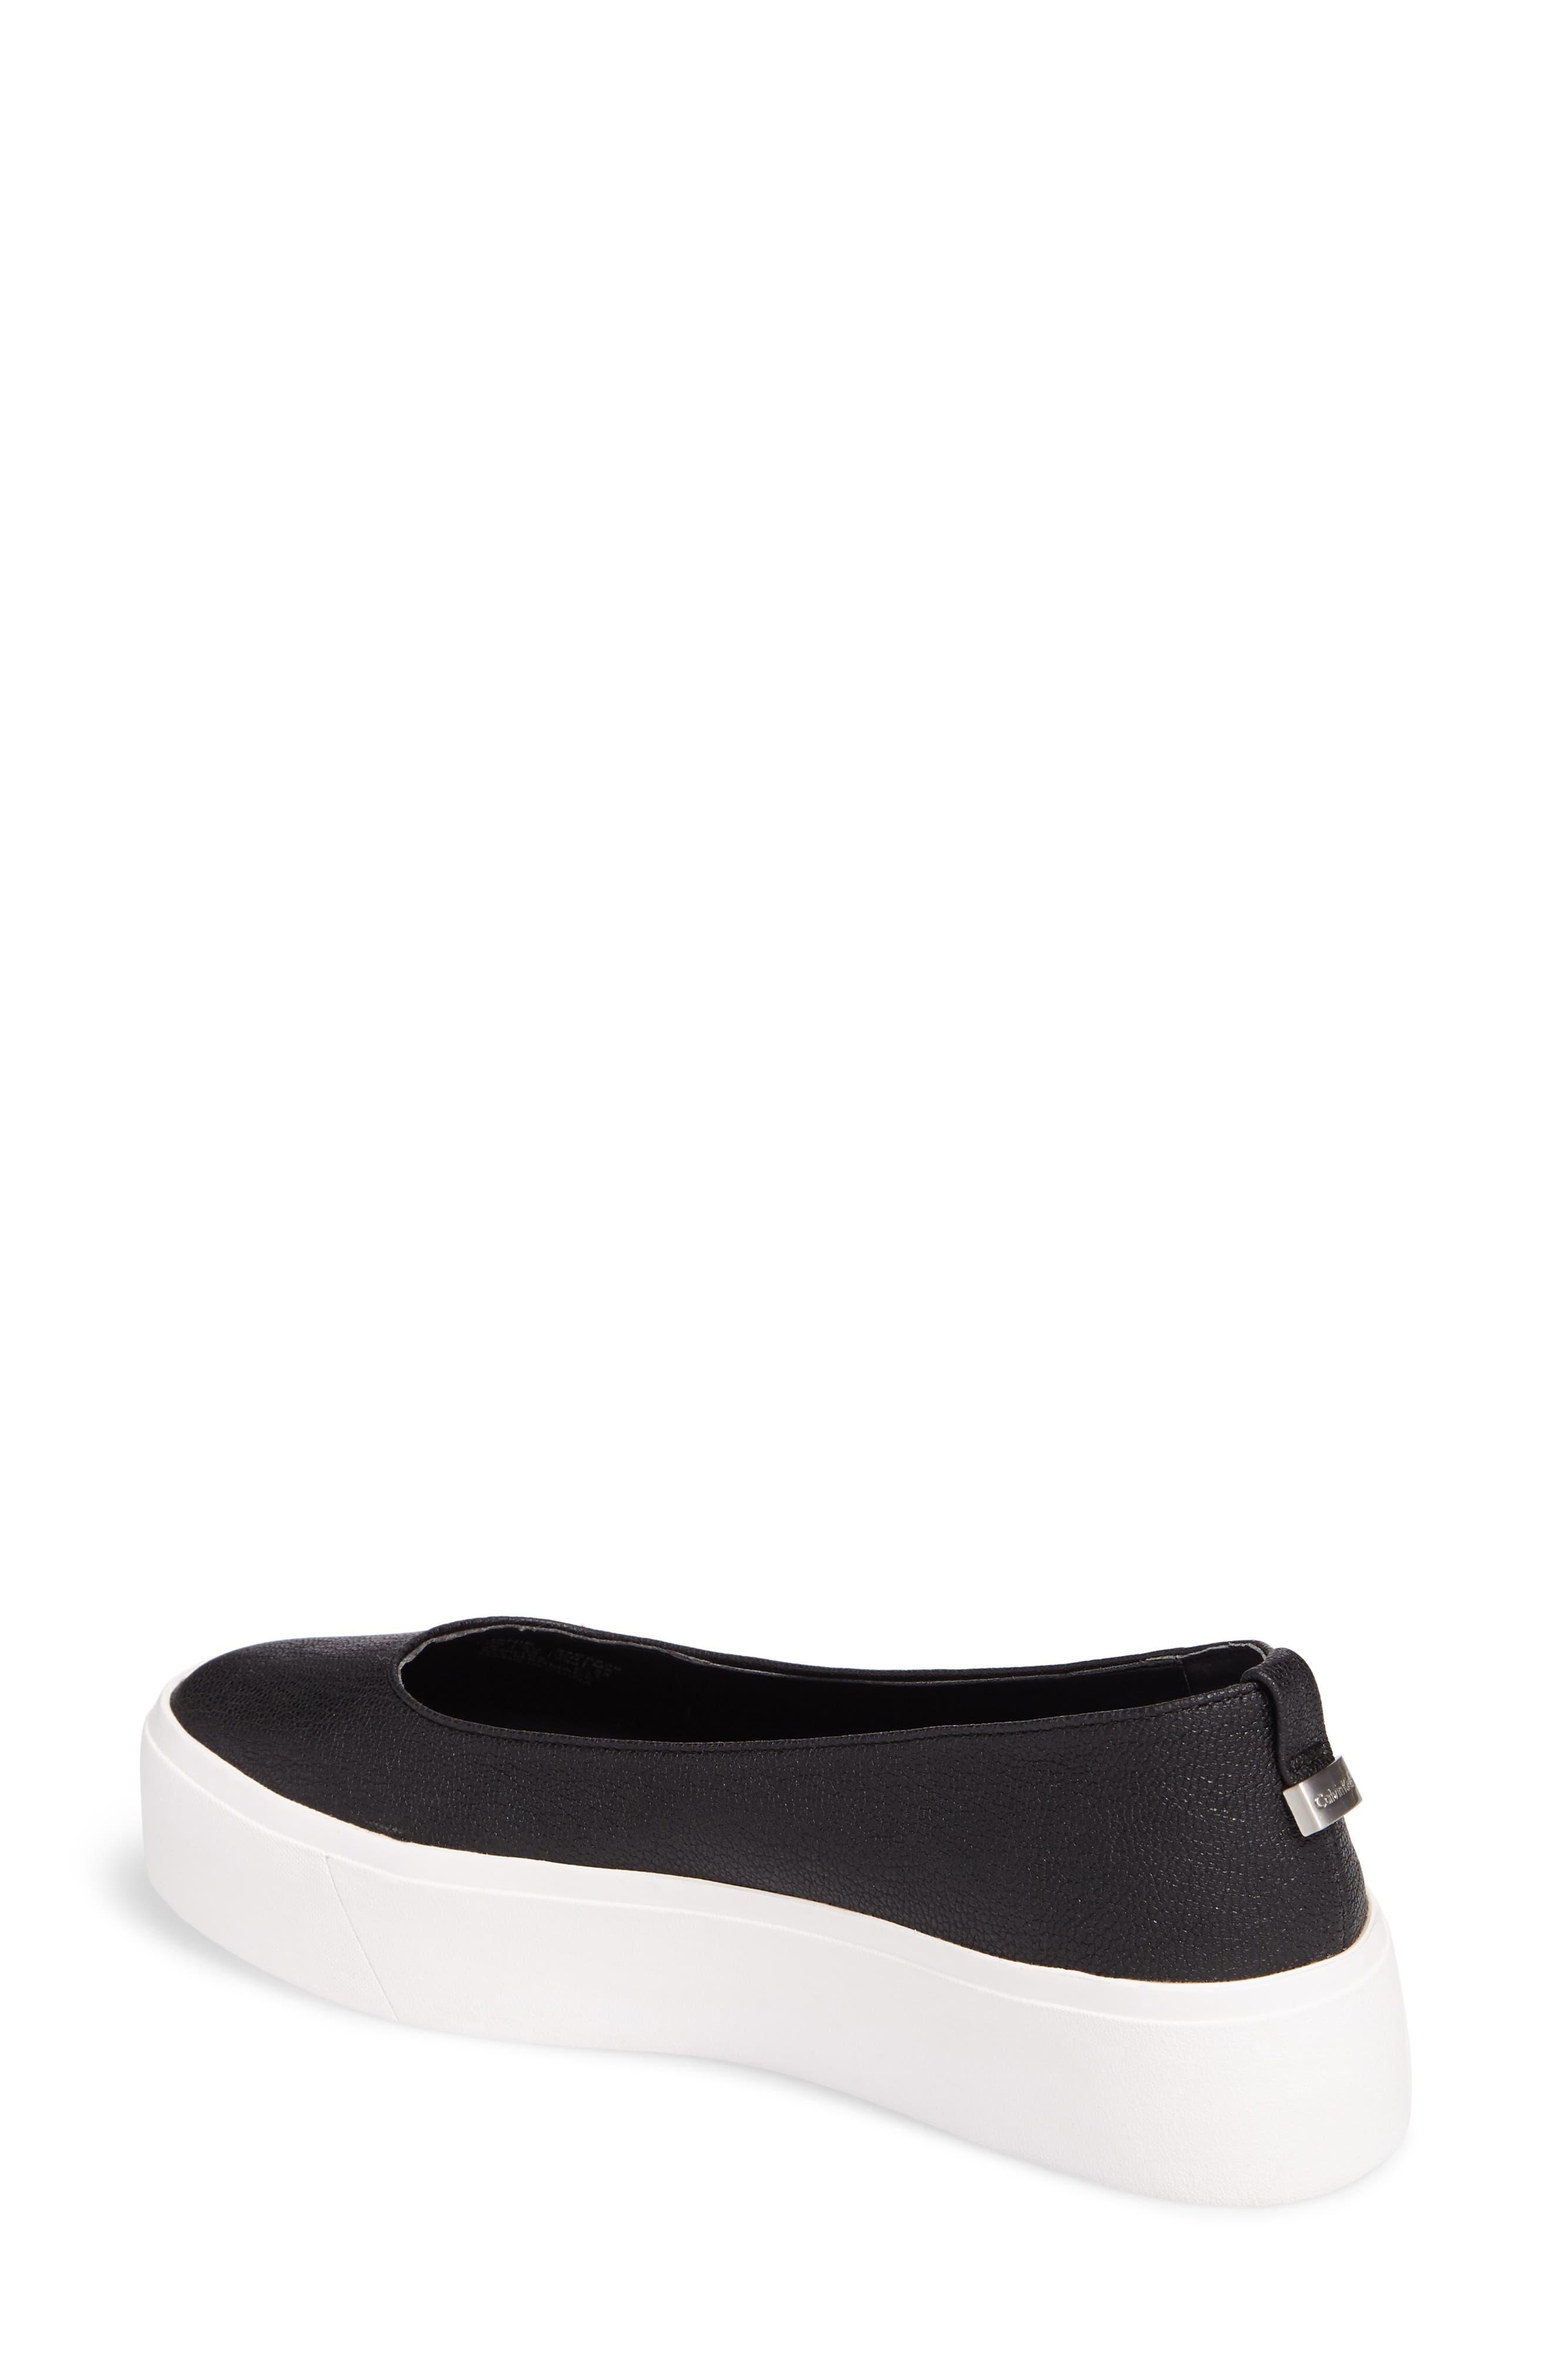 Janie Platform Flat,                             Alternate thumbnail 2, color,                             Black Pebble Leather